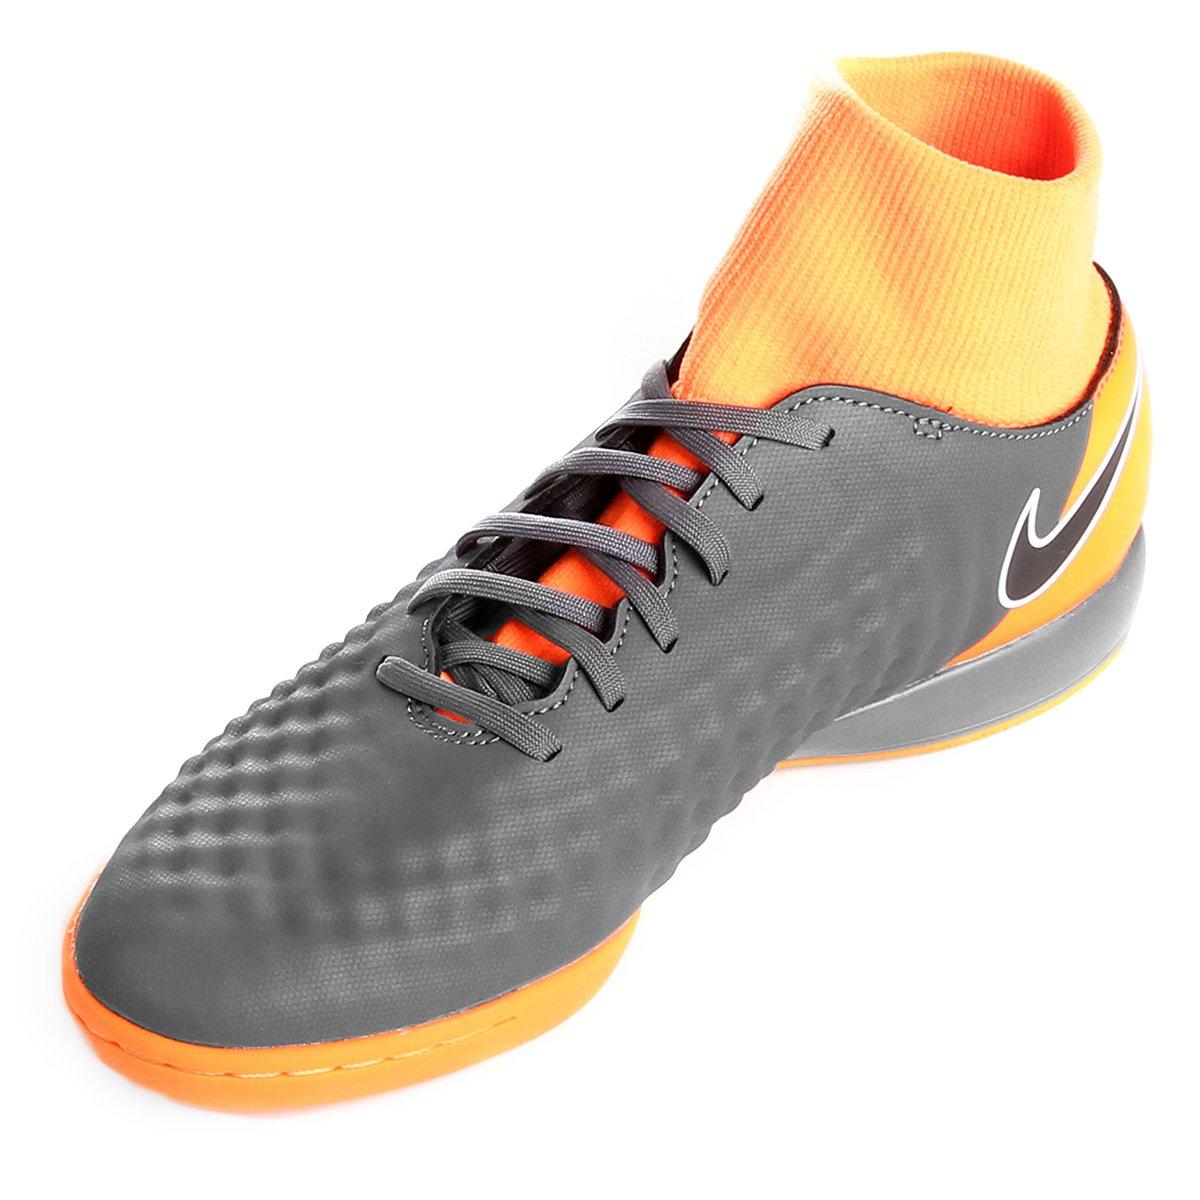 e67933ec57 ... Magista Preto Masculina Fit Academy 2 e Cinza Nike Obra Chuteira  Dinamic Futsal 4qEHaa